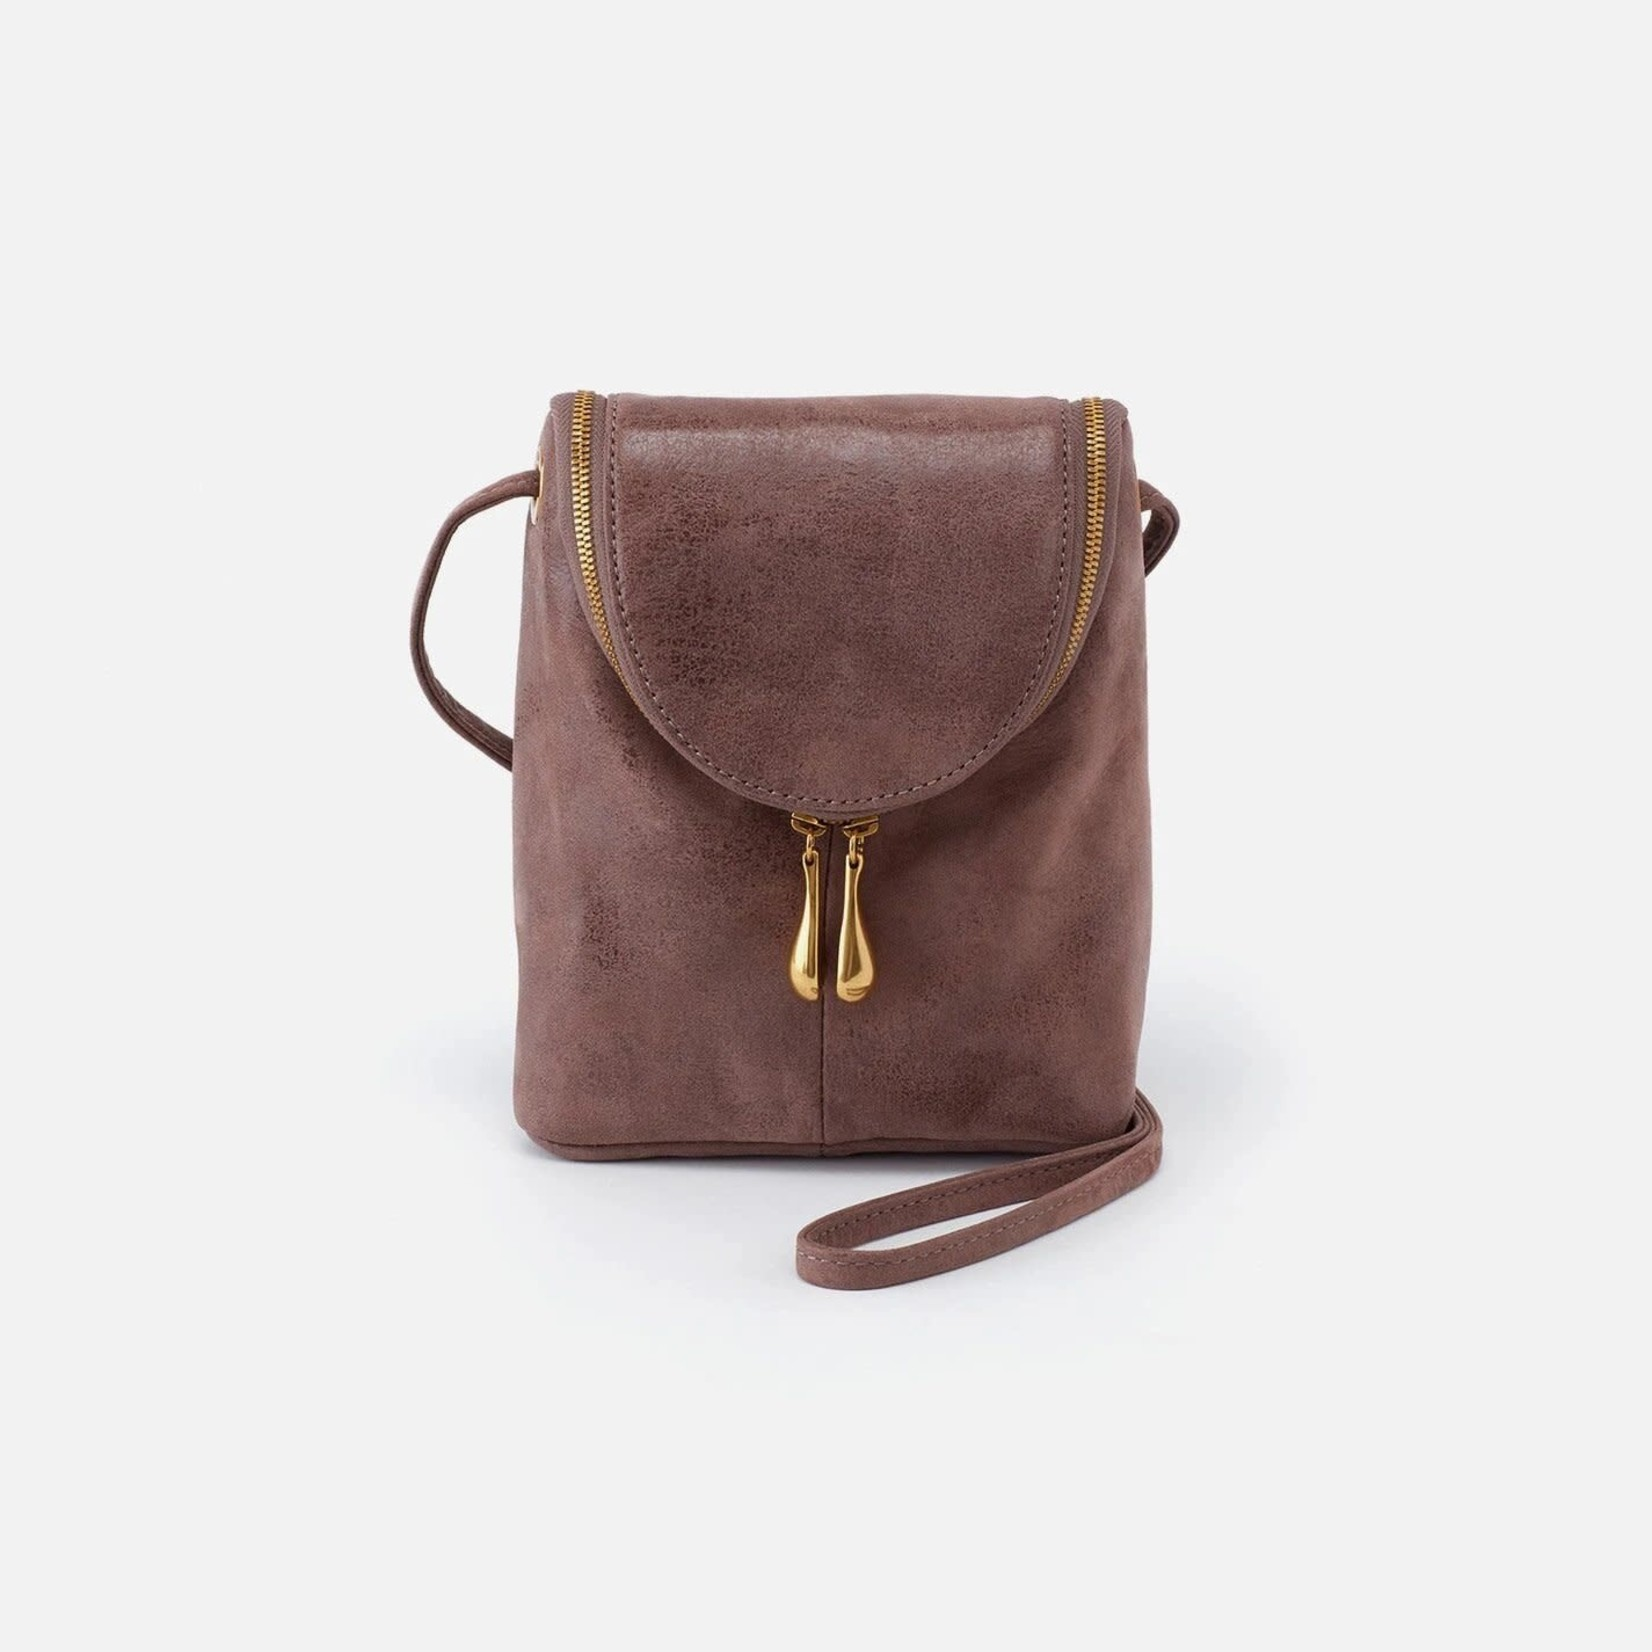 HOBO FERN BAG